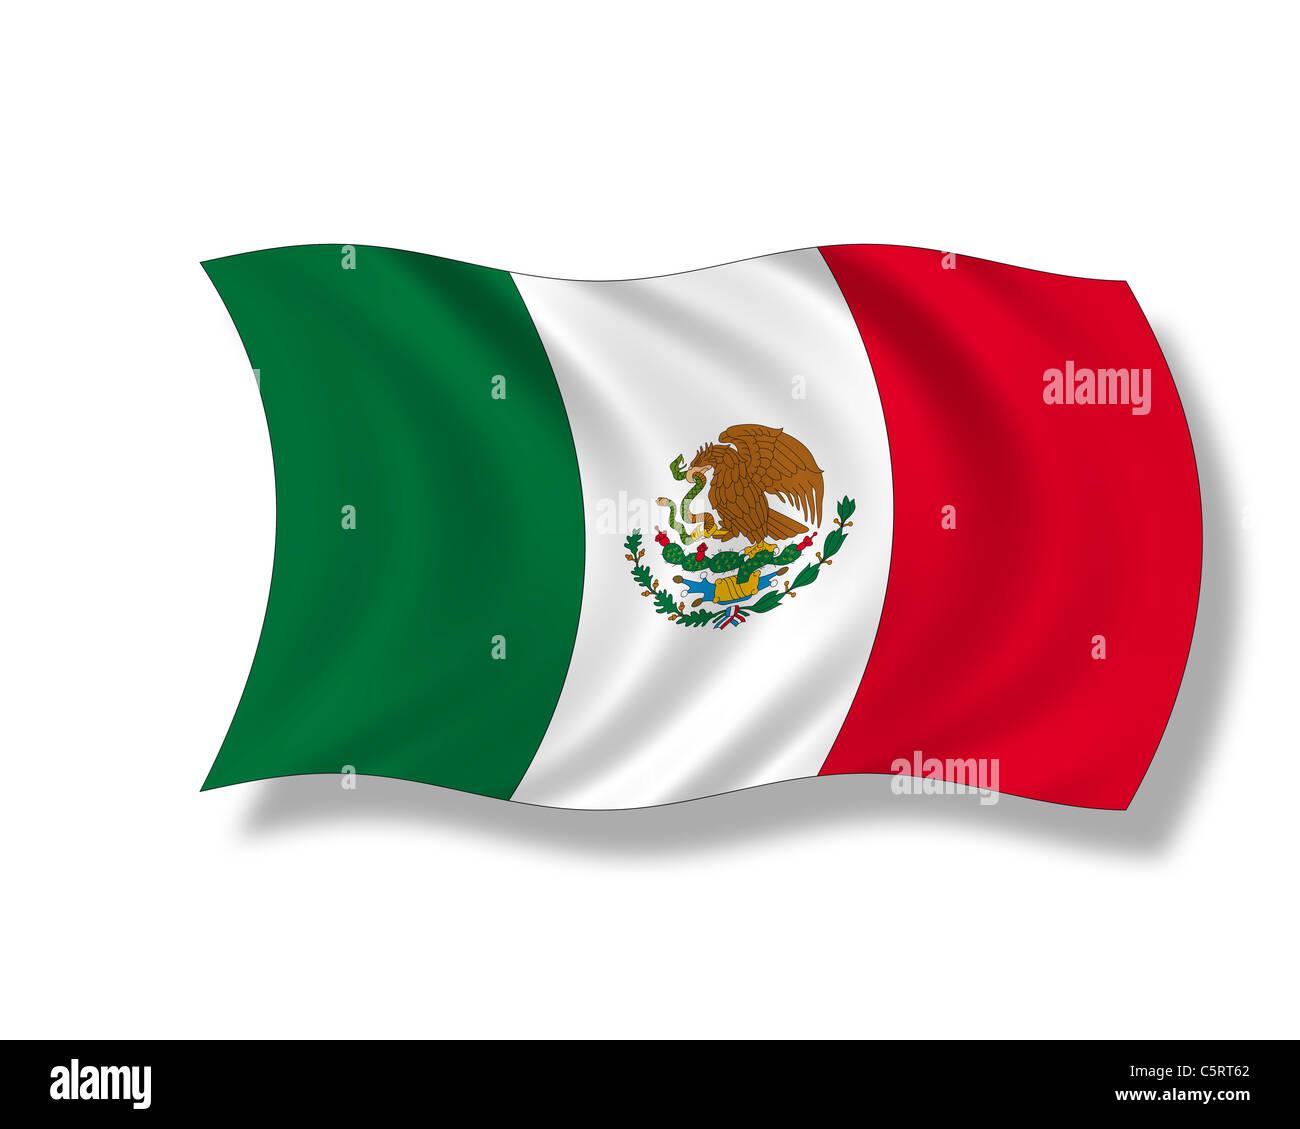 Illustration, Flag of Mexico - Stock Image